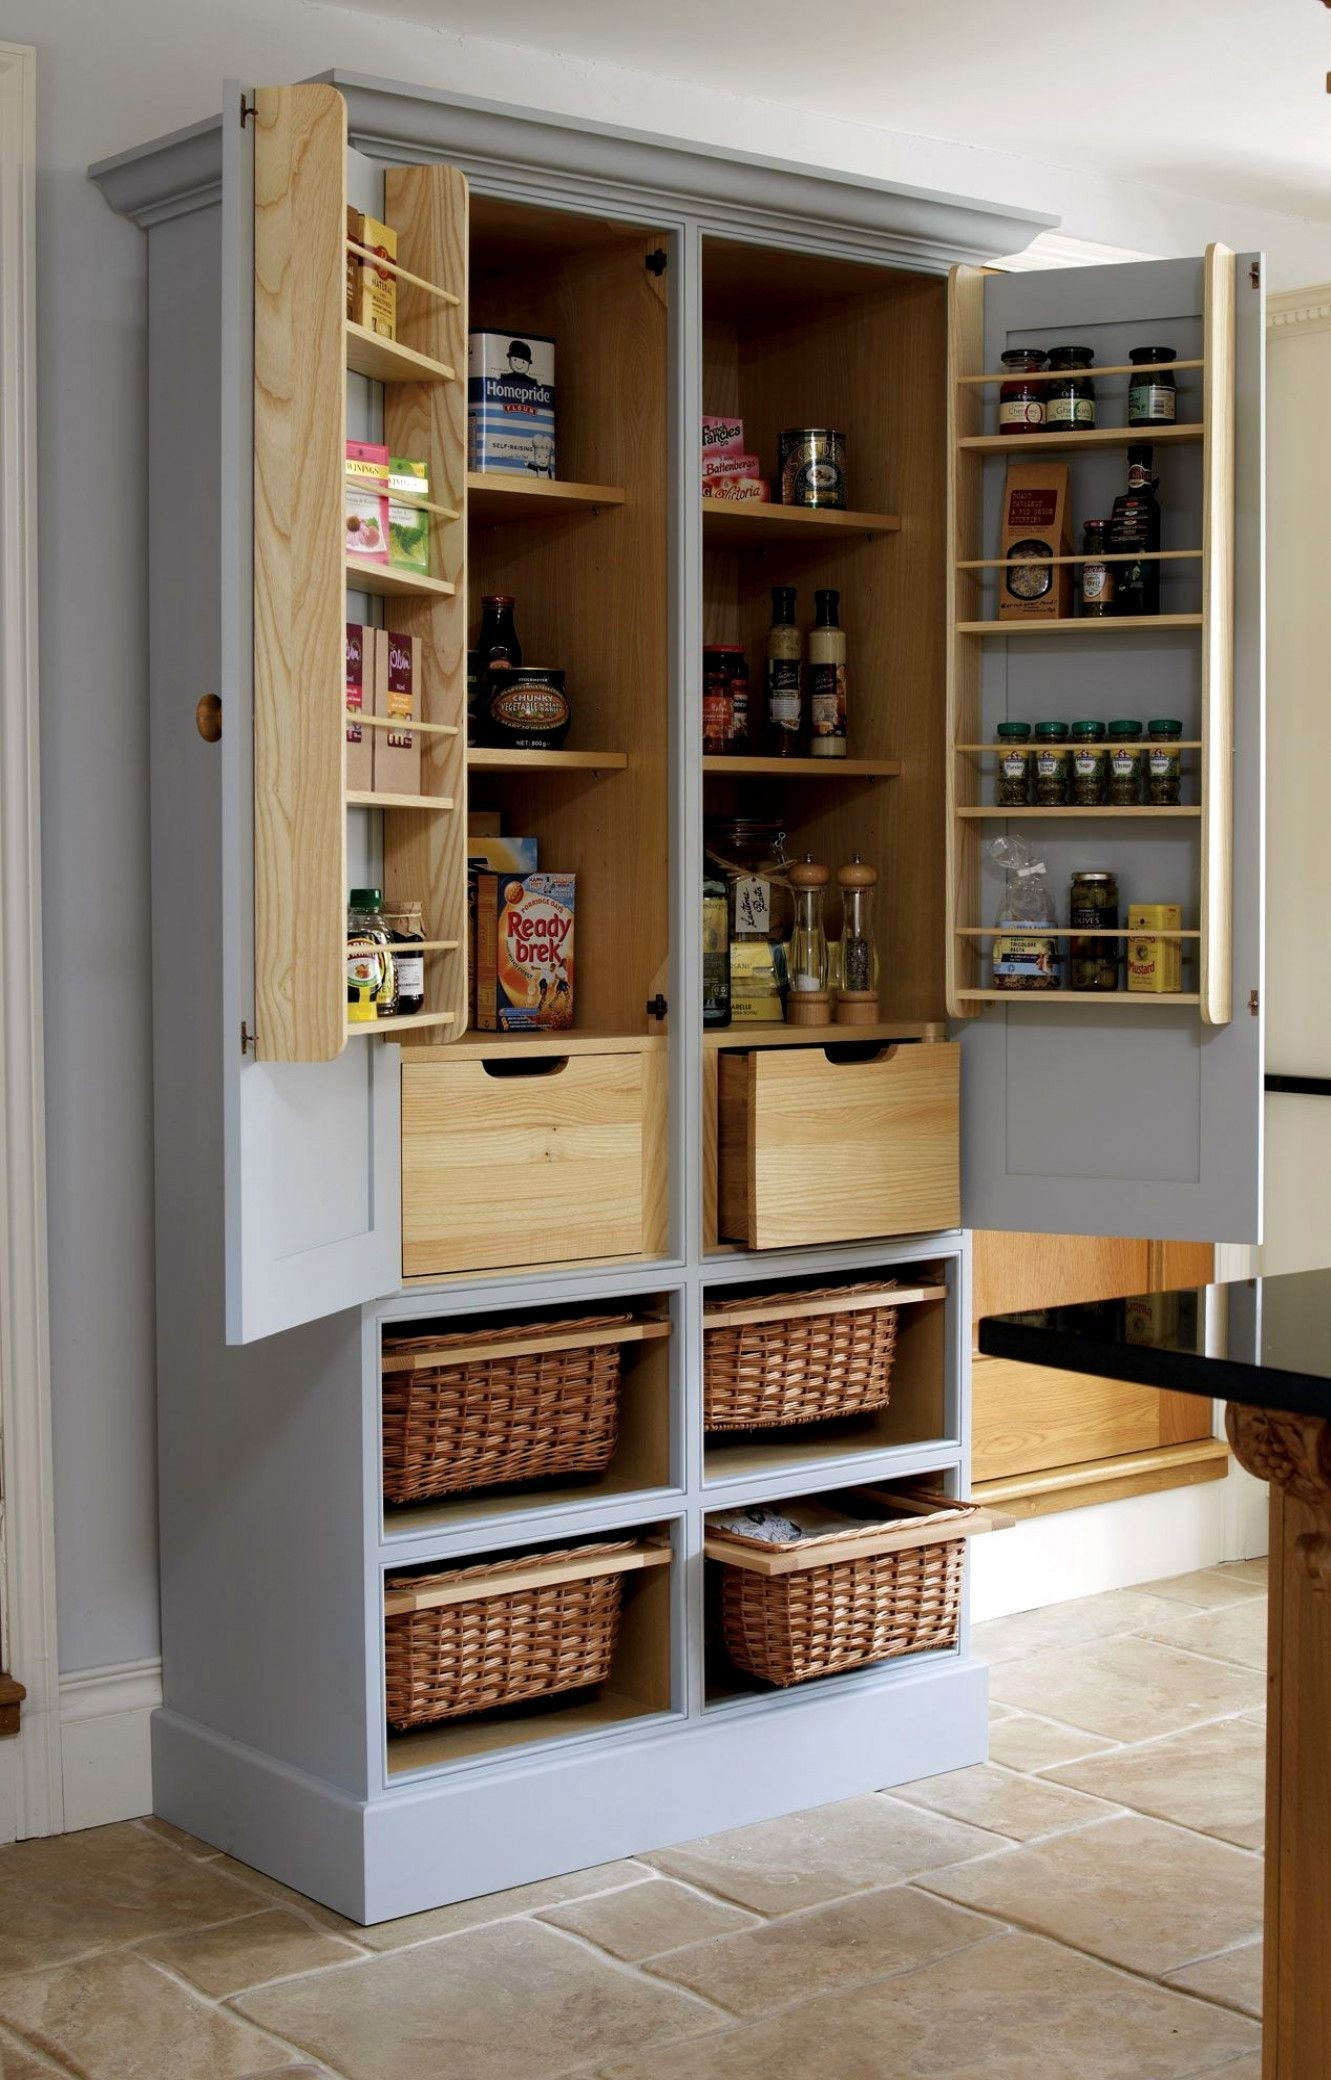 Kitchen pantry cabinet freestanding  sc 1 st  Foter & Freestanding Cabinets - Ideas on Foter